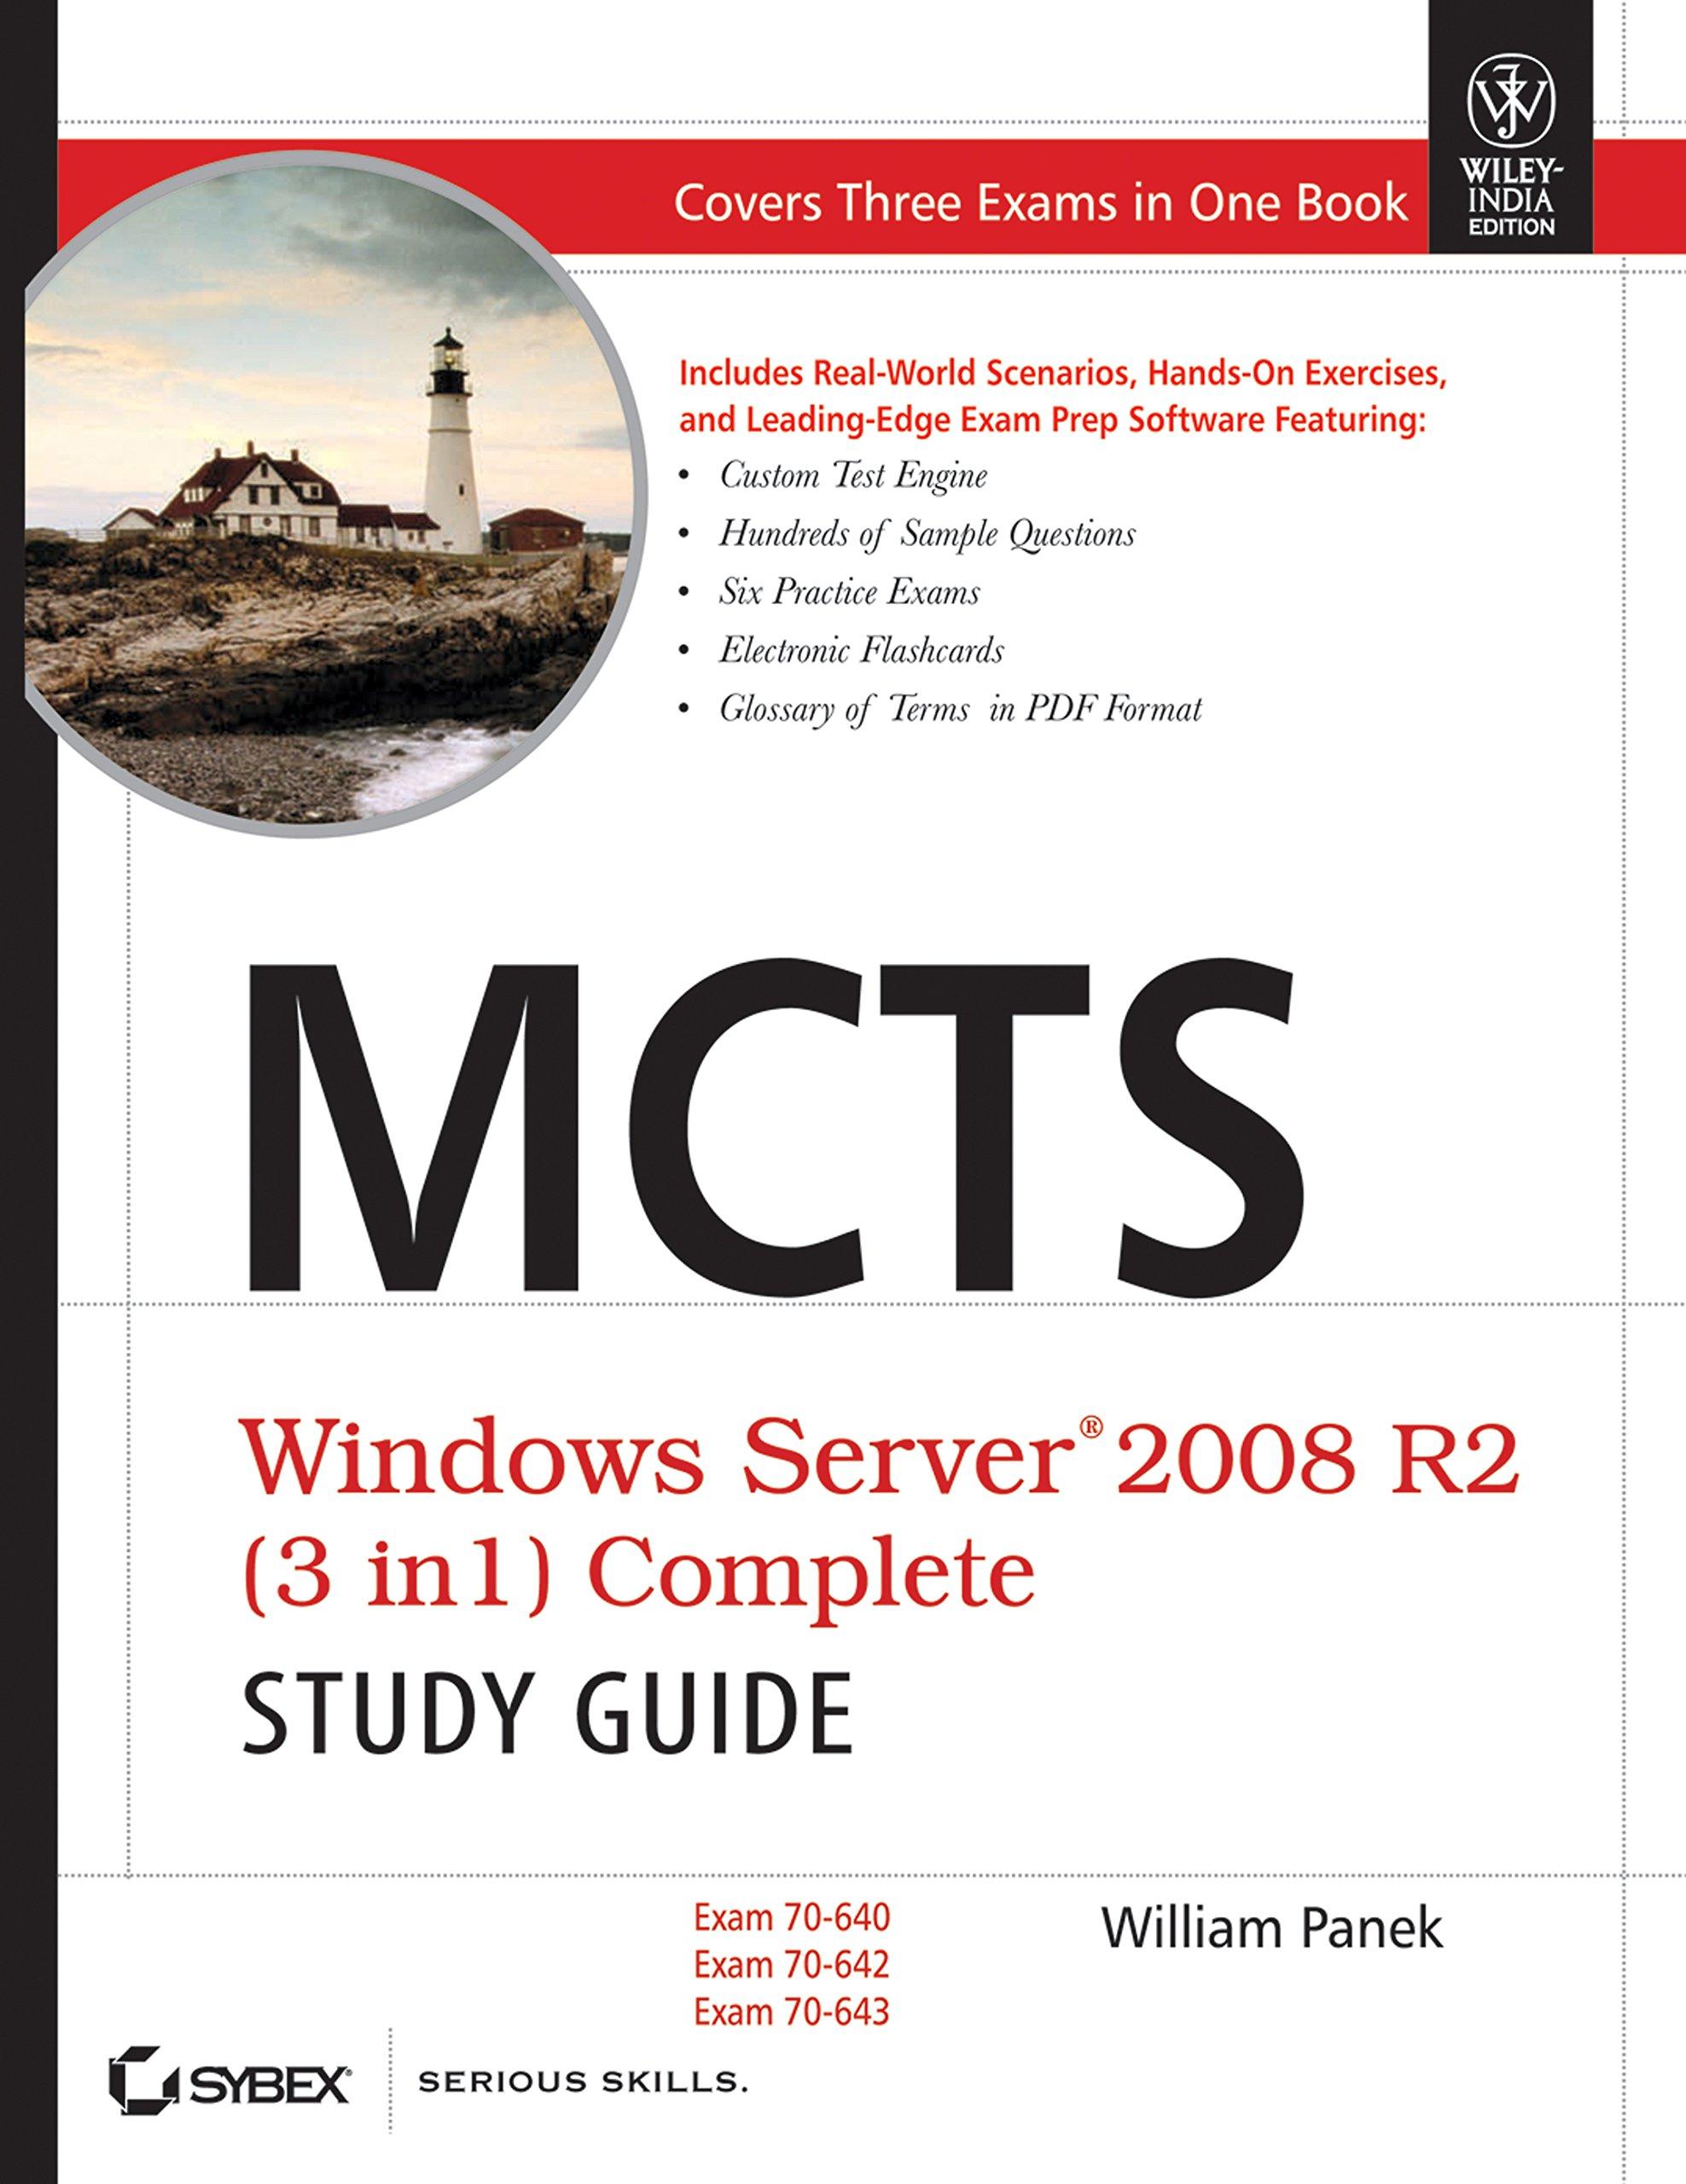 MCTS Windows Server 2008 R2 (3 in 1) Complete Study Guide: Exam 70-640, 70-642,  70-643: William Panek: 9788126531547: Amazon.com: Books